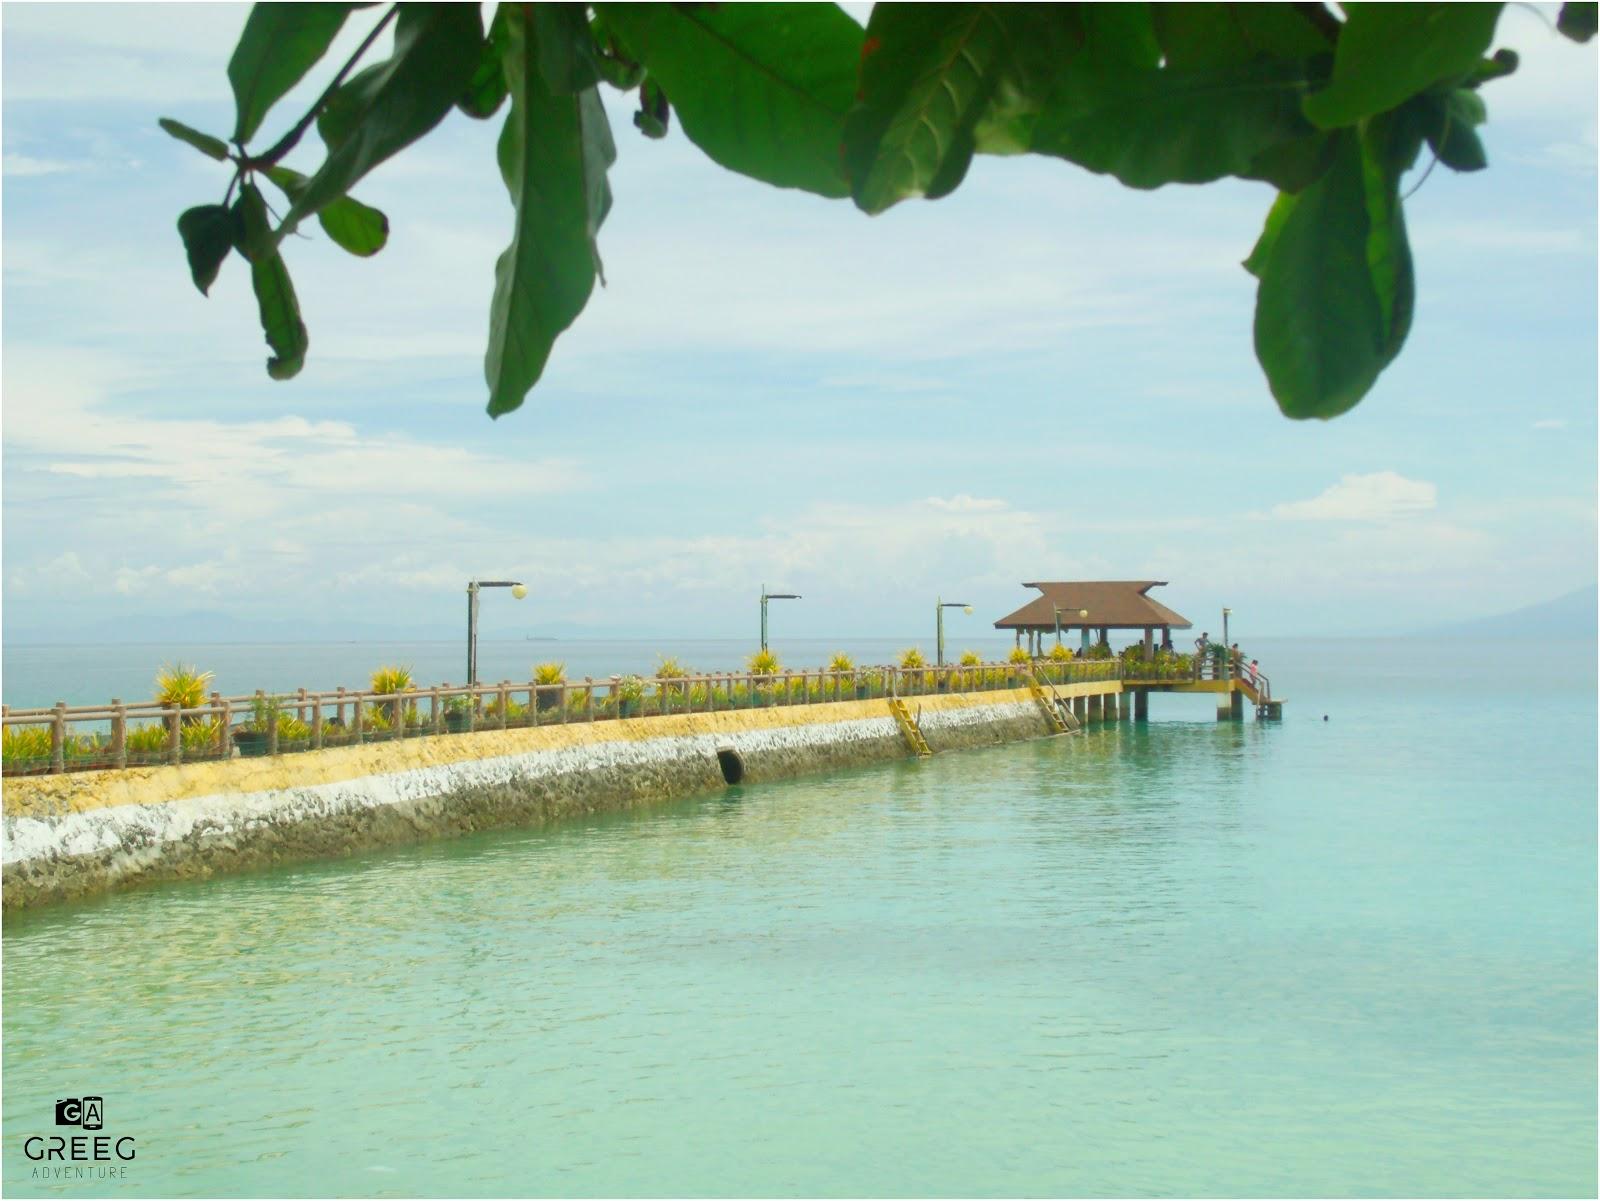 Golden Bay Beach Resort and Spa | Greeg Adventure